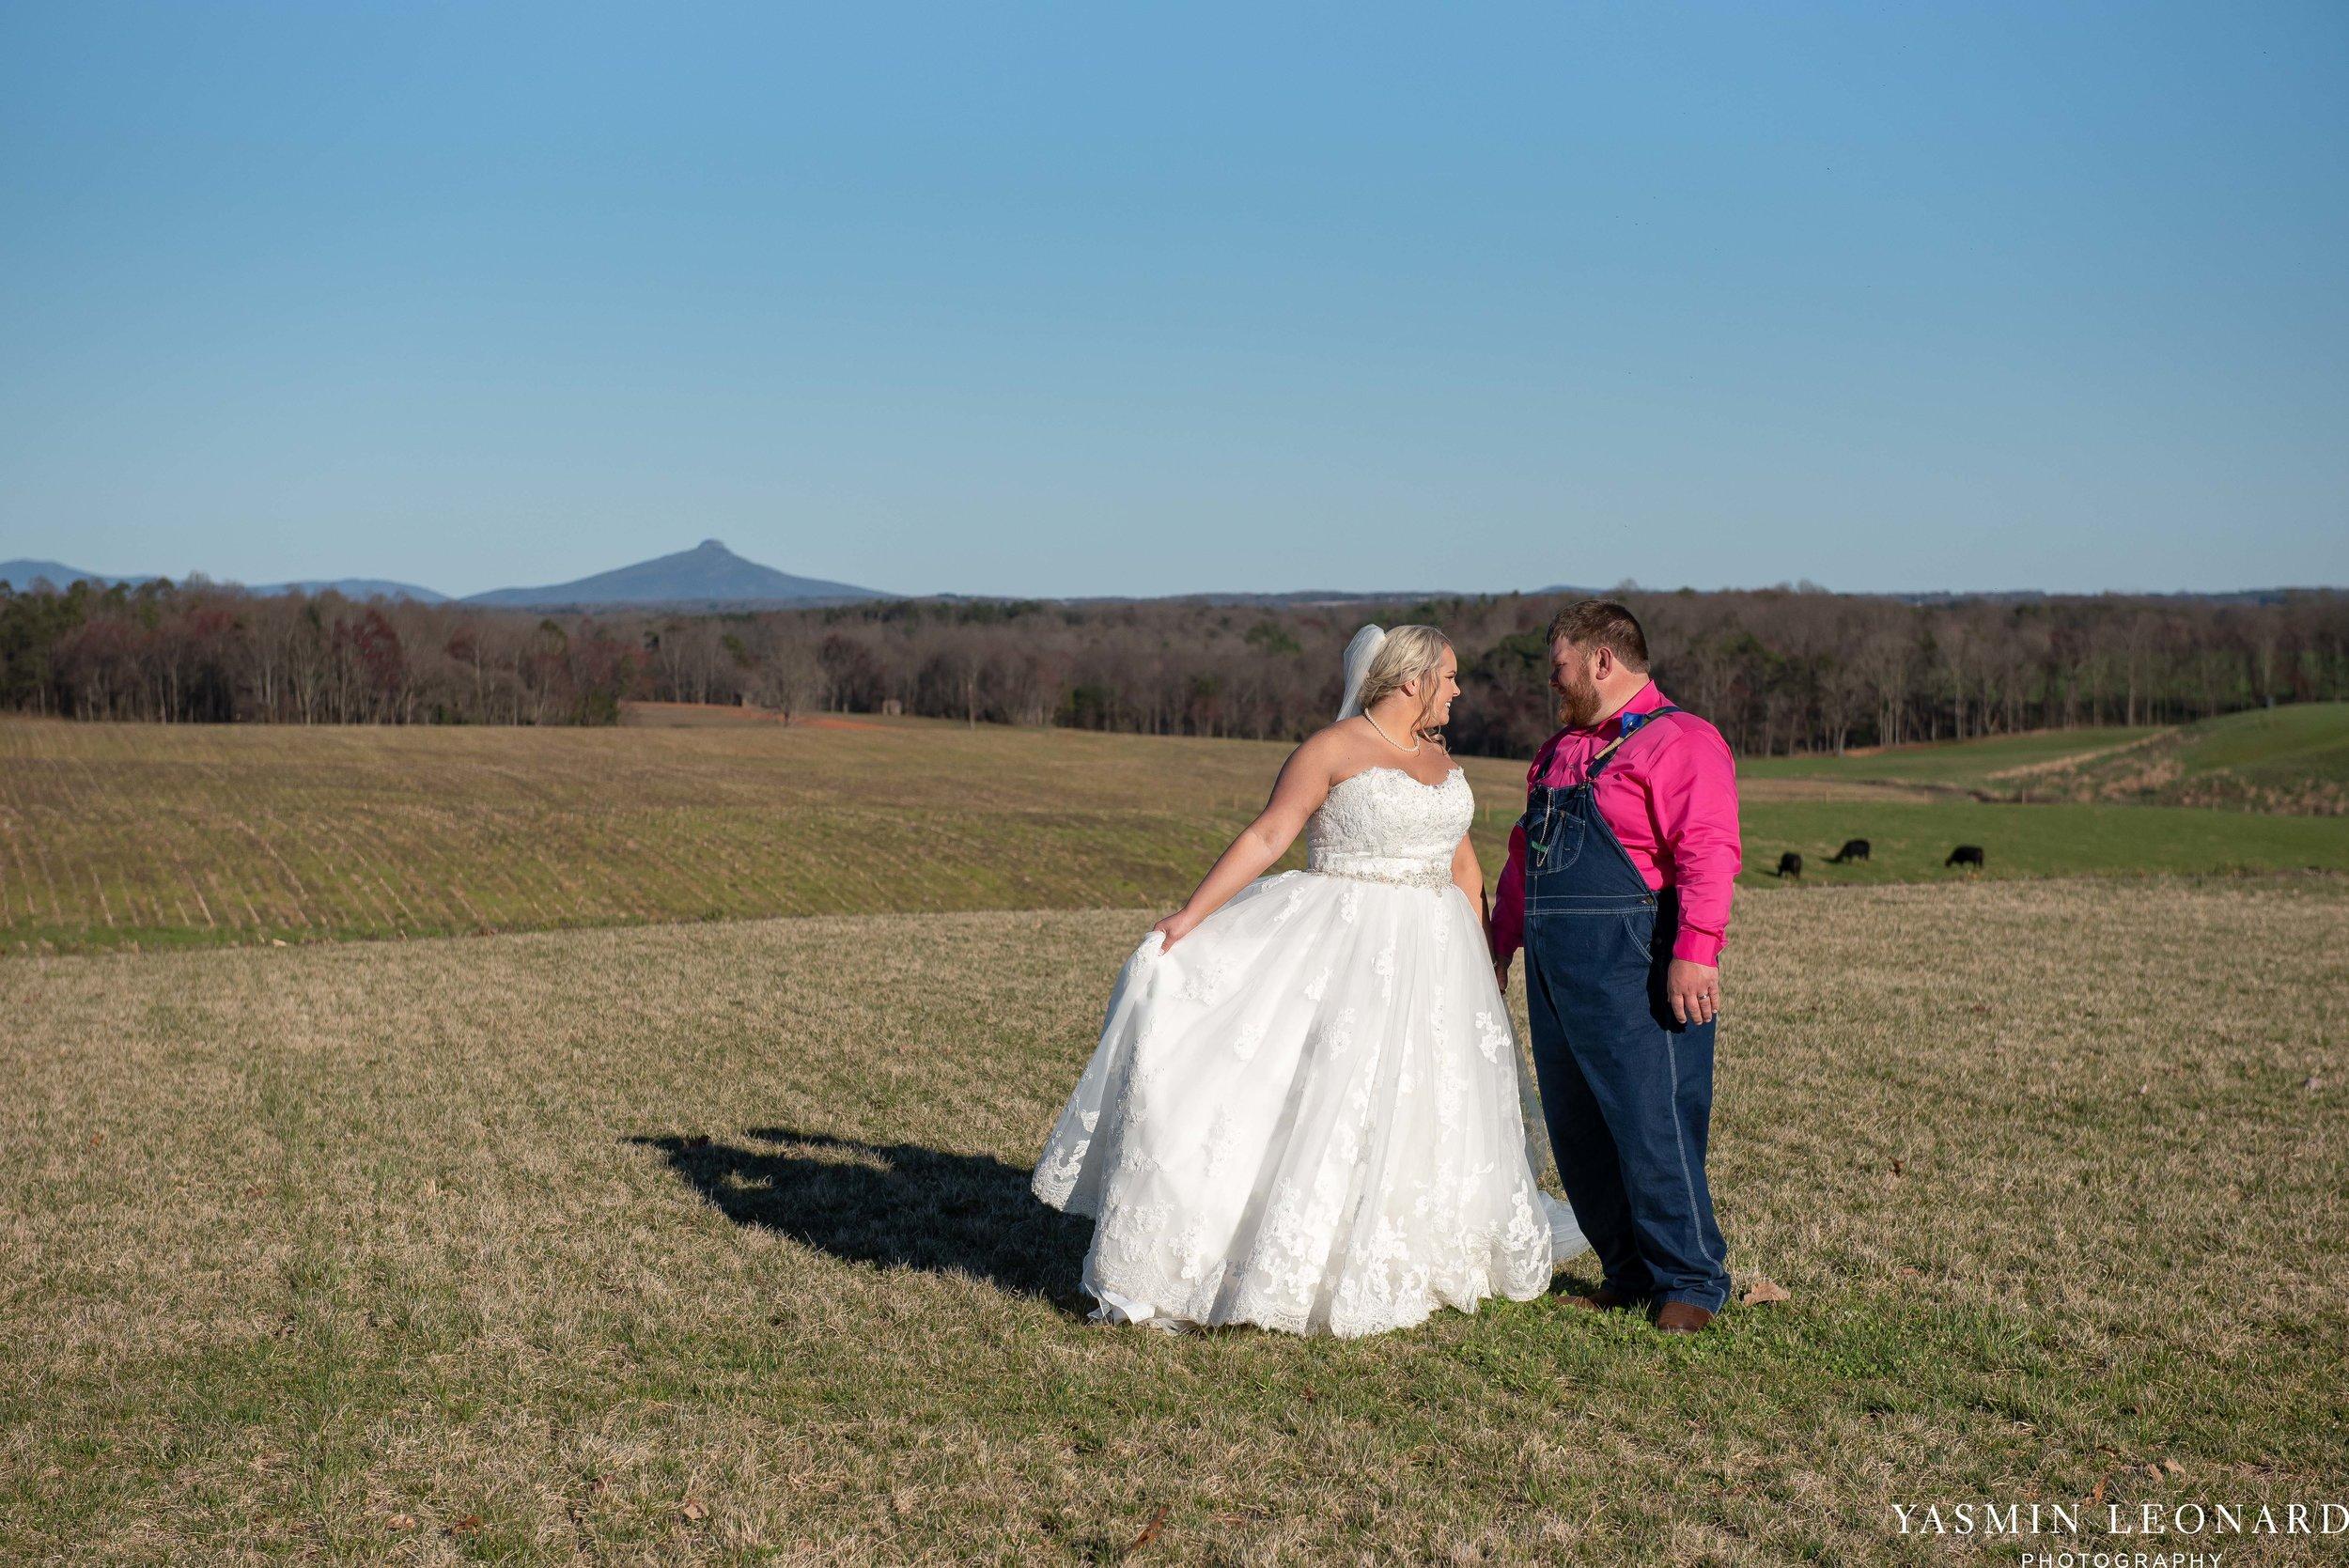 The Barn at Heritage Farm - Country Wedding - Pink and Blue Wedding - Barn Wedding - Outdoor Wedding - Cotton and Wheat Decor - Groom in Bibs - Pink Bridal Colors - Yasmin Leonard Photography-20.jpg